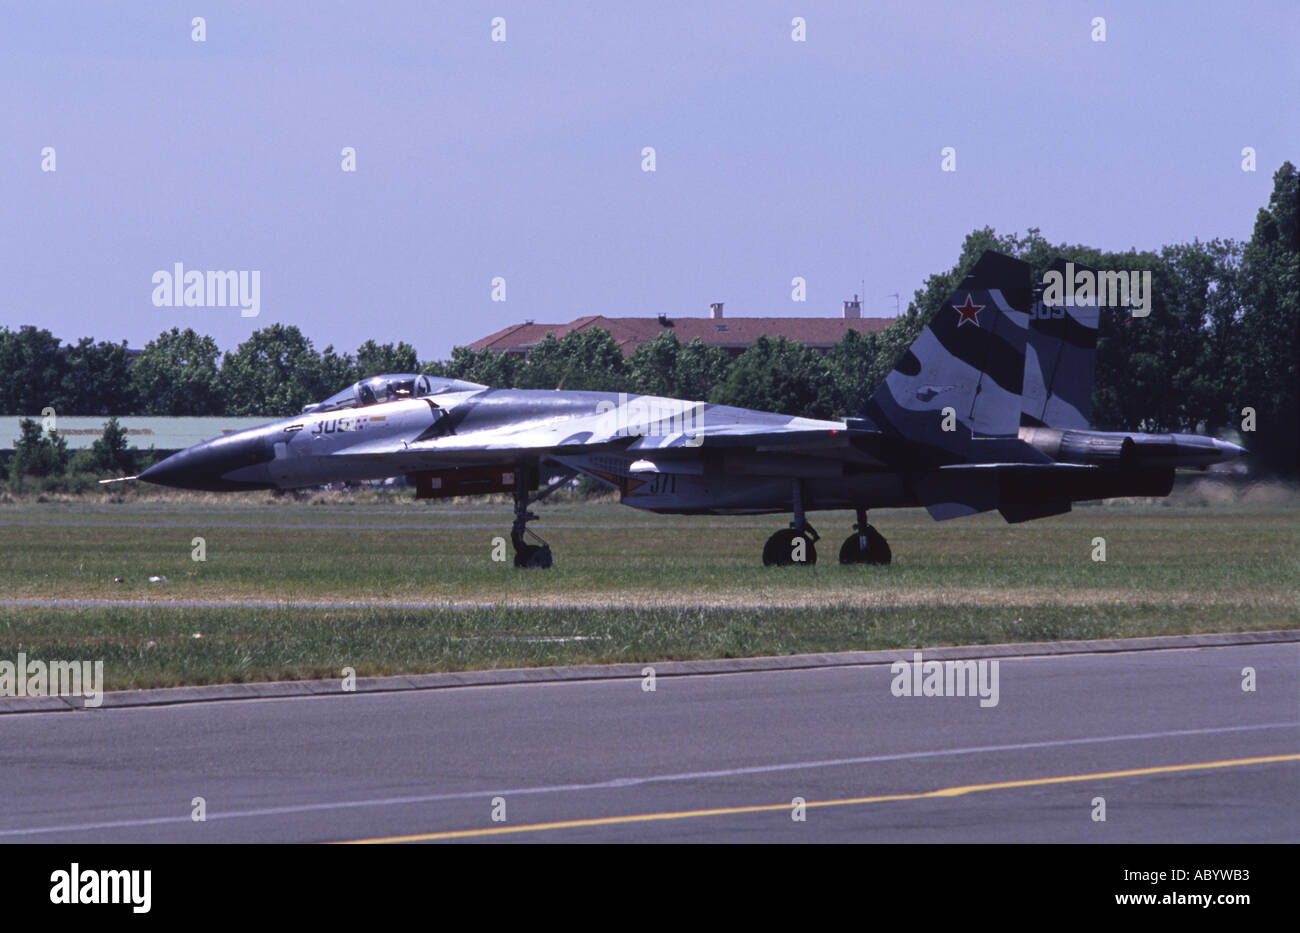 Sukhoi Su 27 SMKL Flanker - Stock Image